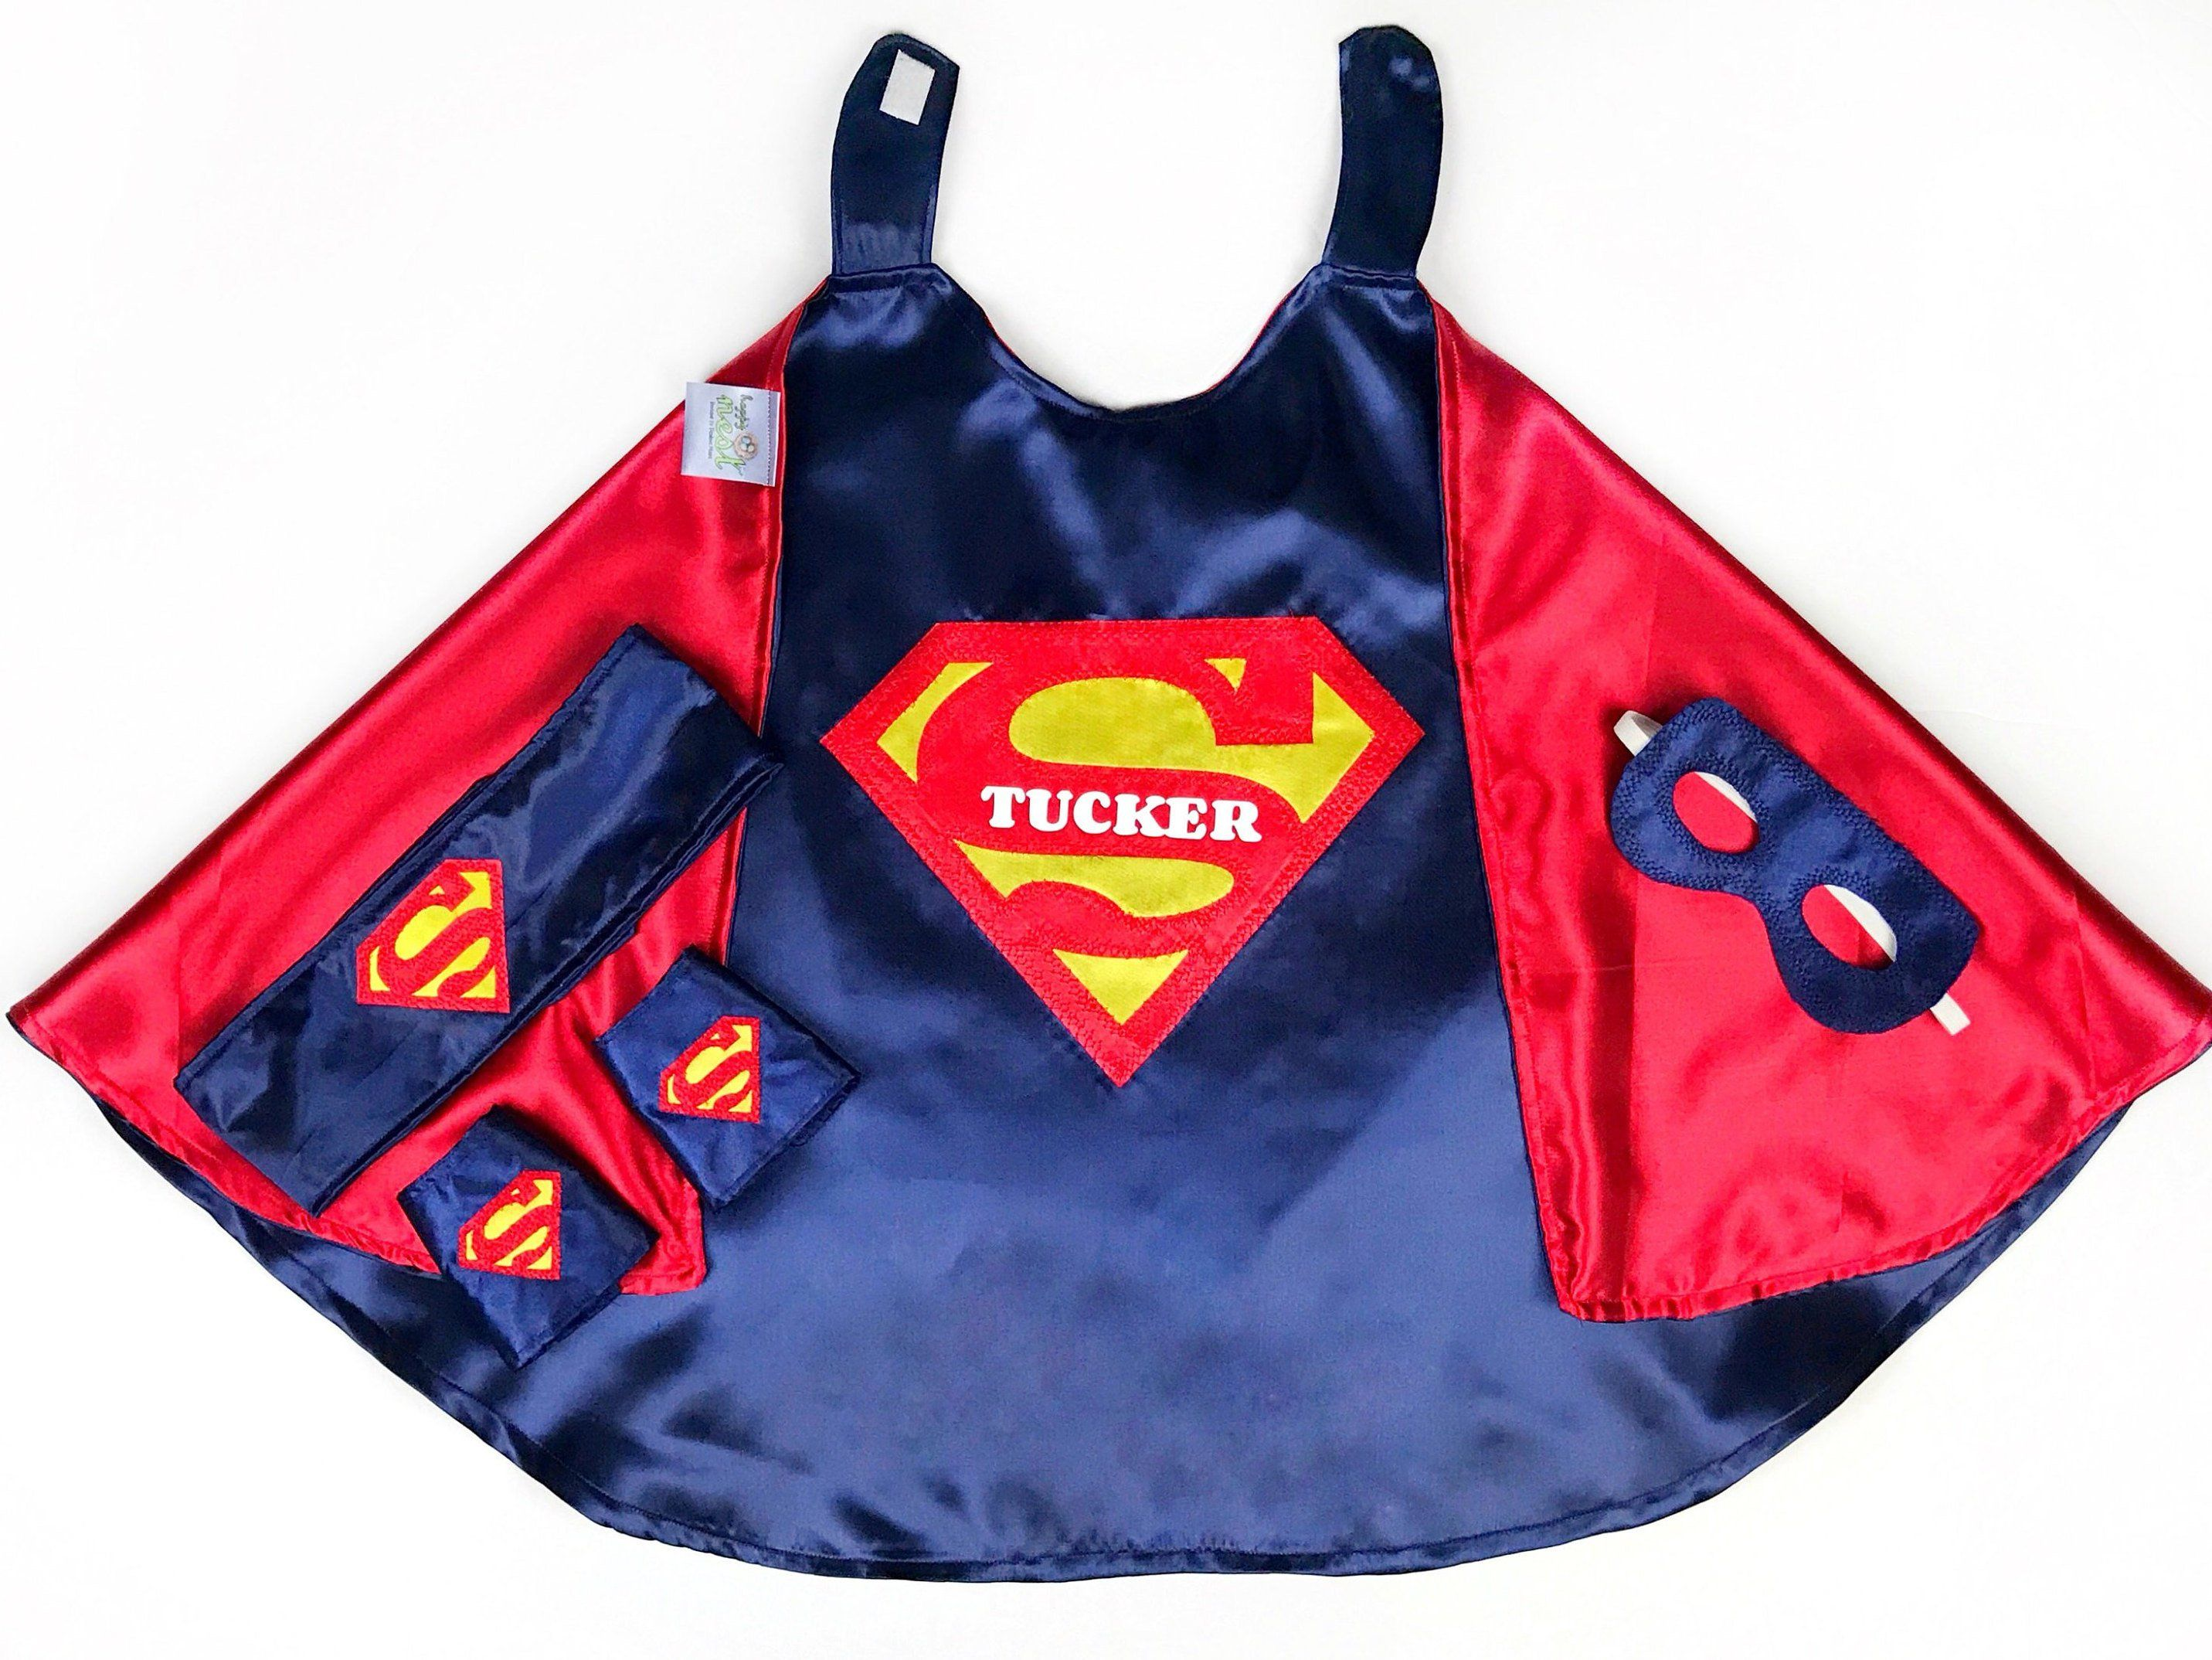 Personalized Superman Cape Set Boy Capes Birthday Costumes Kids Gift Dress Up Superhero